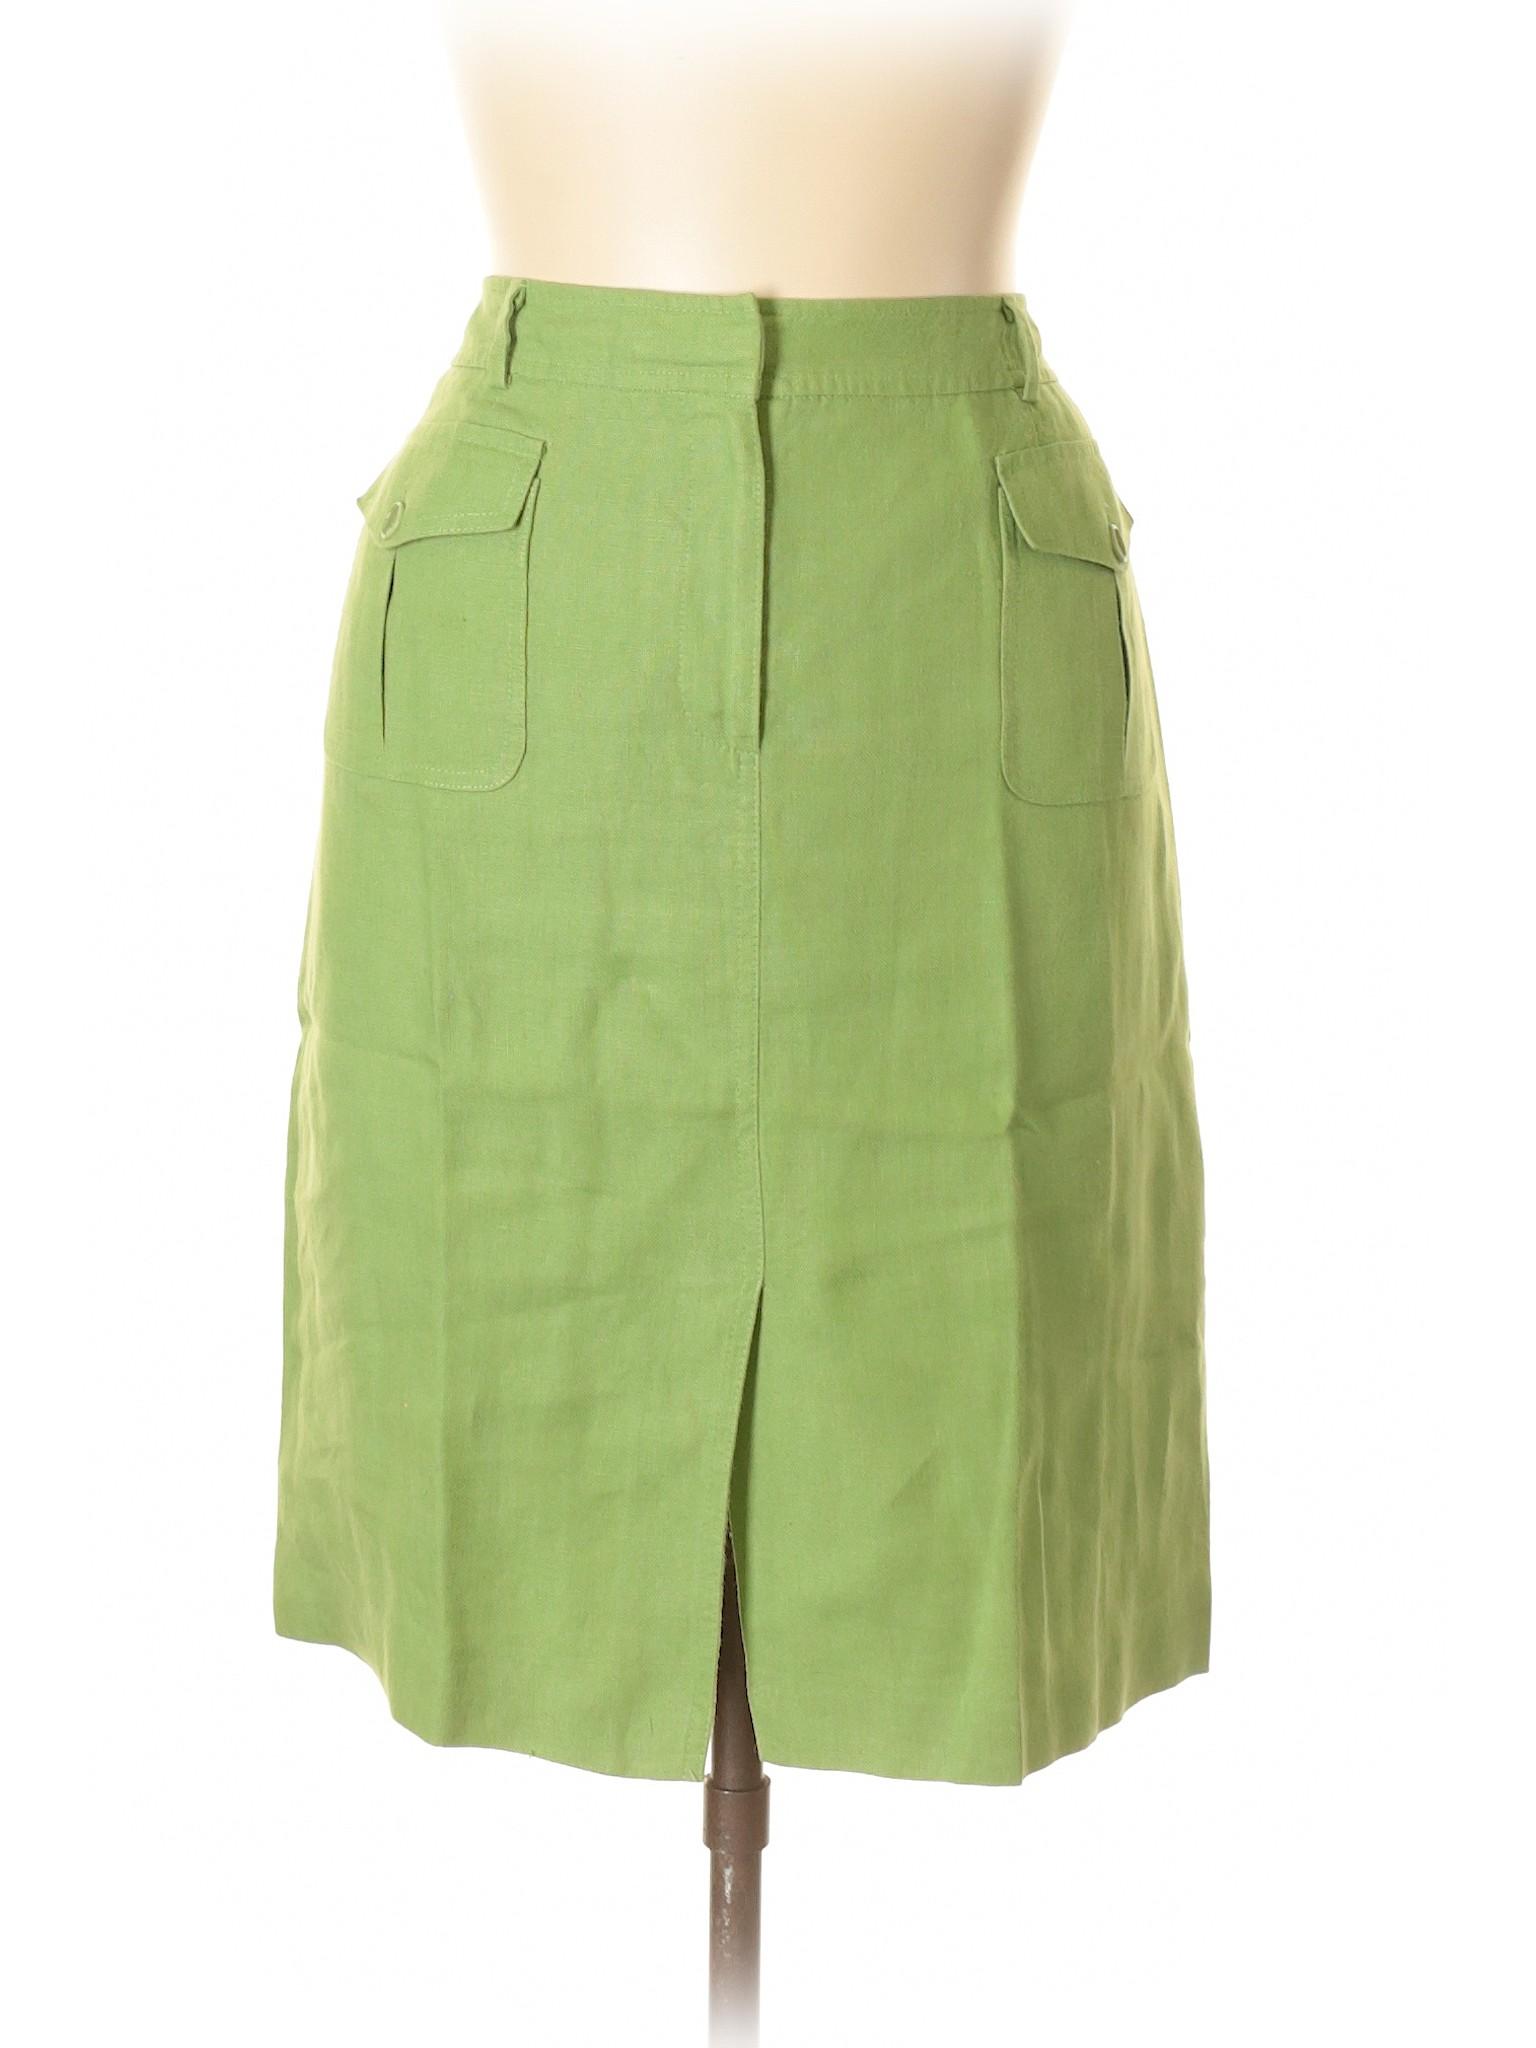 Casual Casual Skirt Boutique Casual Skirt Boutique Skirt Skirt Boutique Boutique Casual zqYwvx